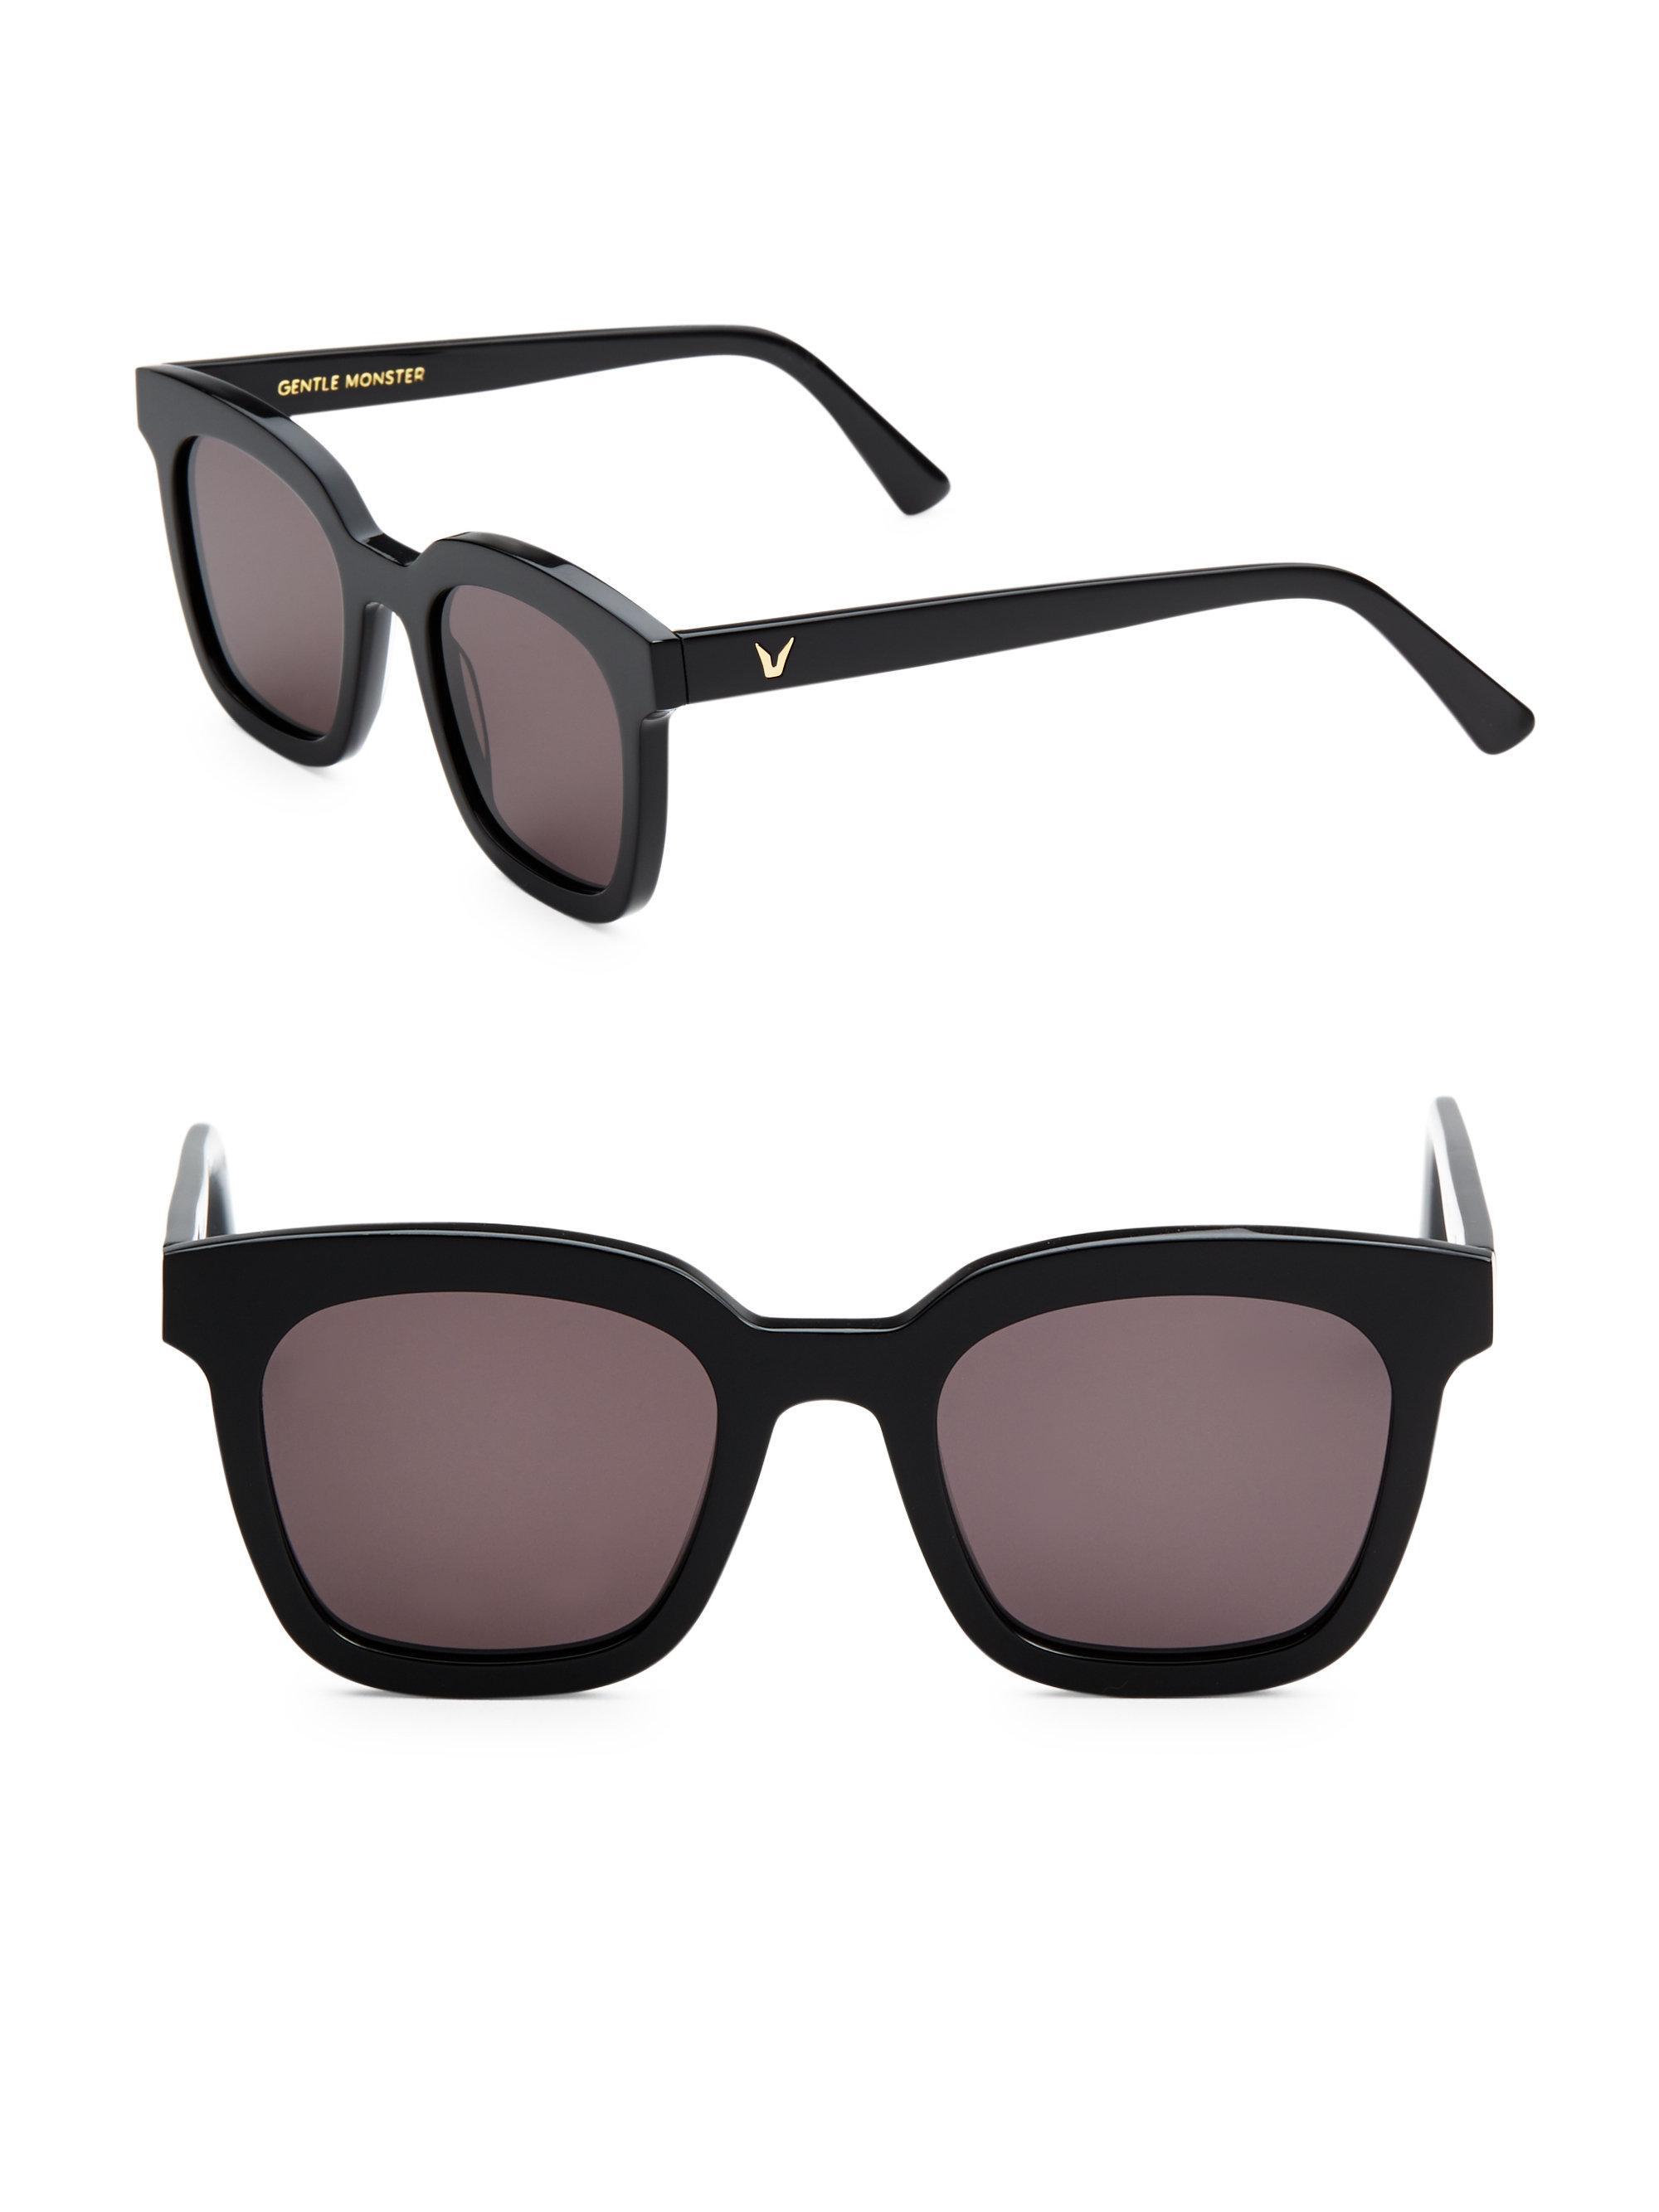 115427baba91 Lyst - Gentle Monster 48mm Finn Wayfarer Sunglasses in Black